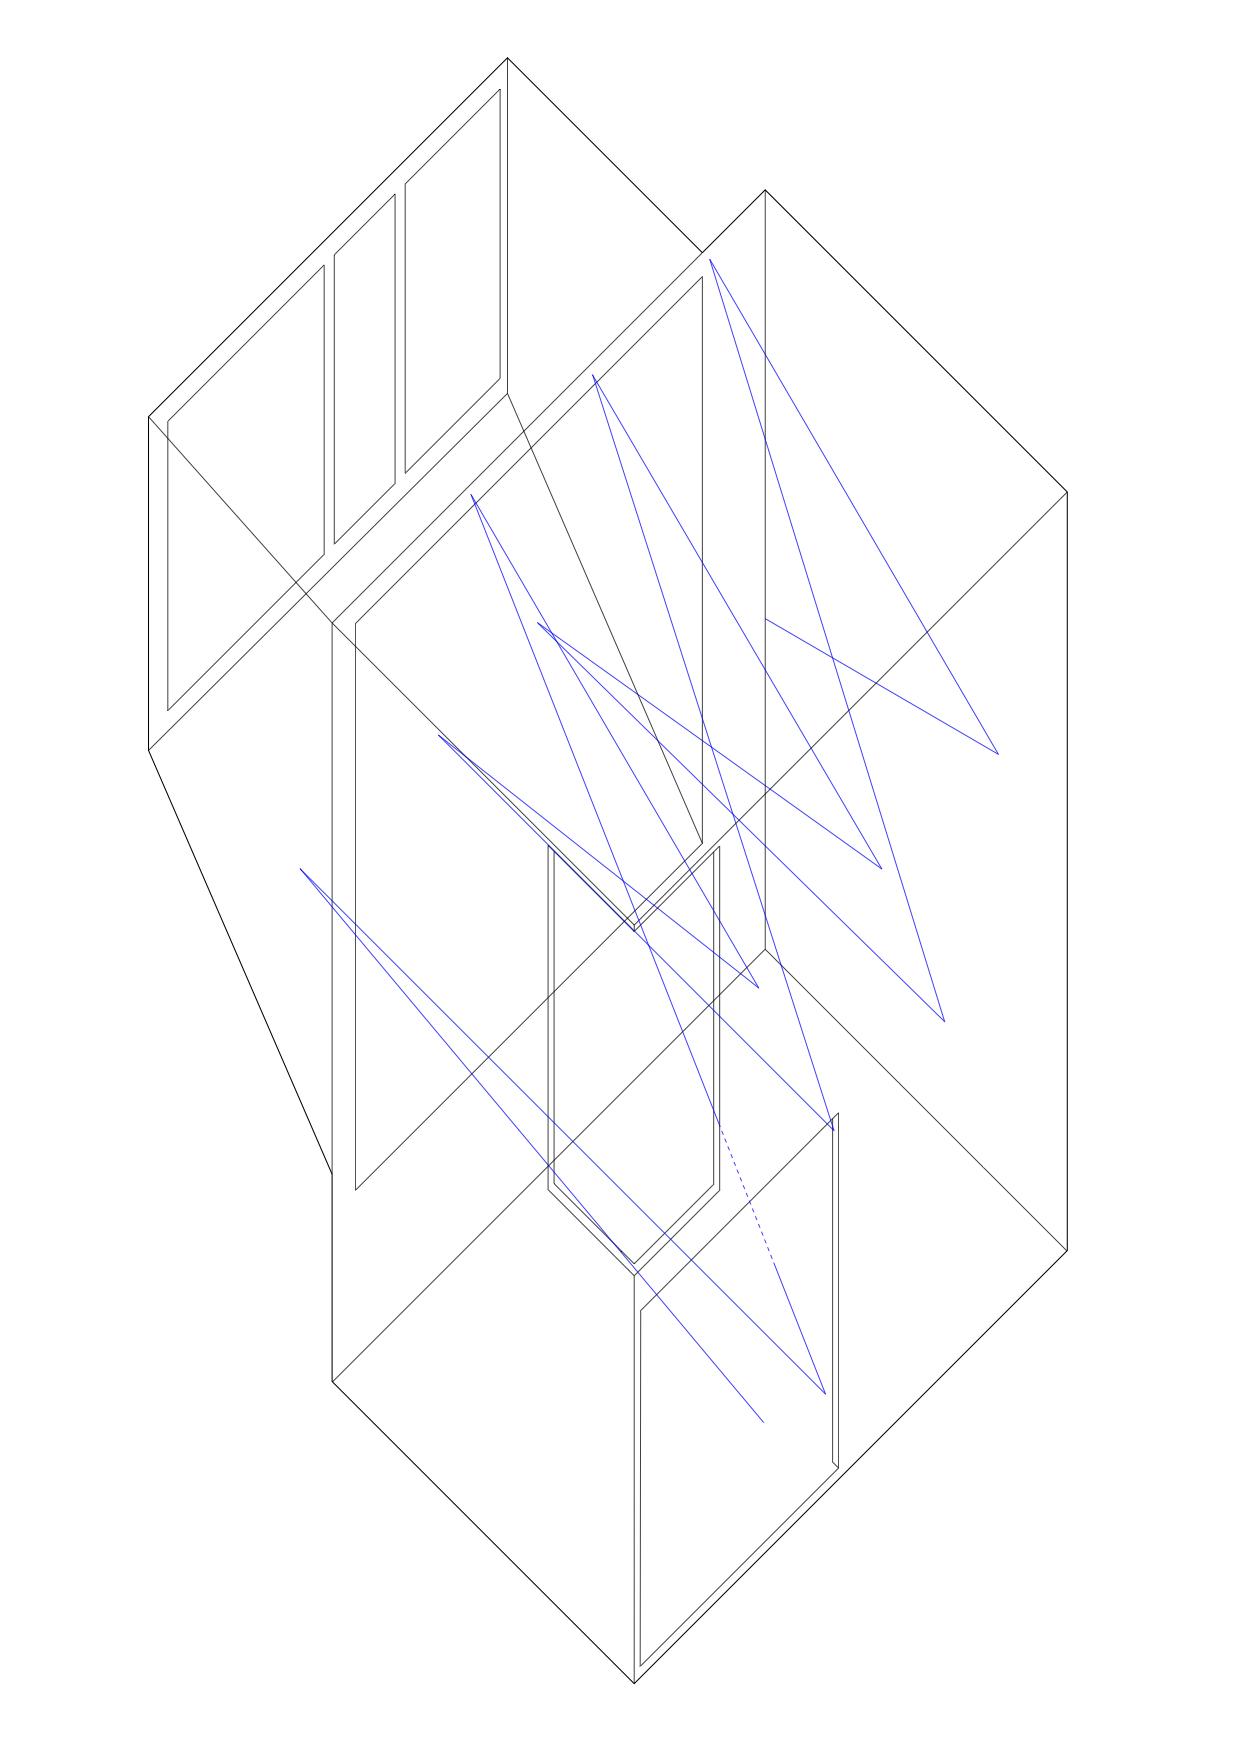 BNKR_Architektur_003